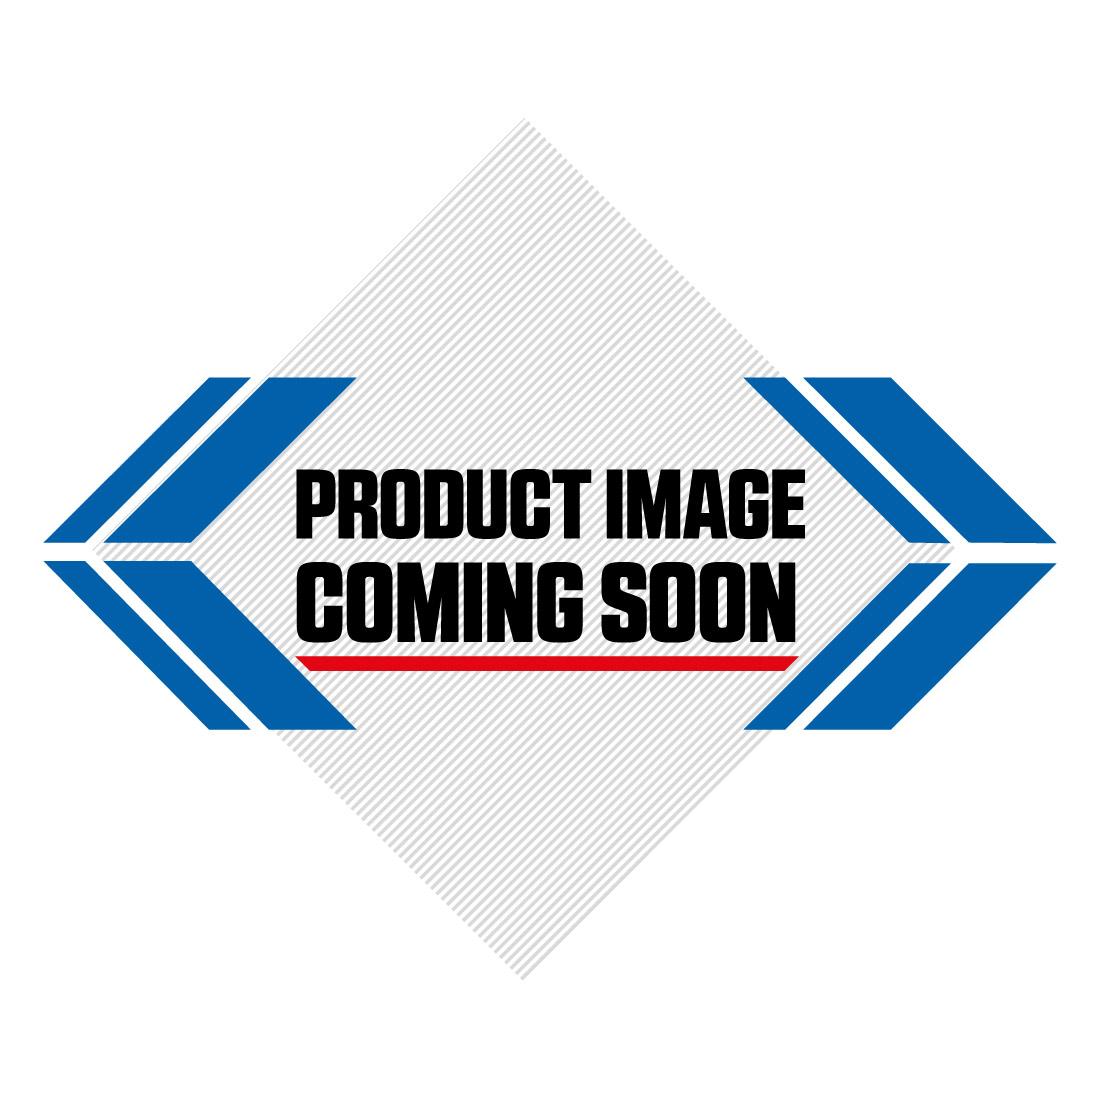 Suzuki Restyled Plastic Kit  RM 85 (00-20) RM Yellow 01-on Image-3>